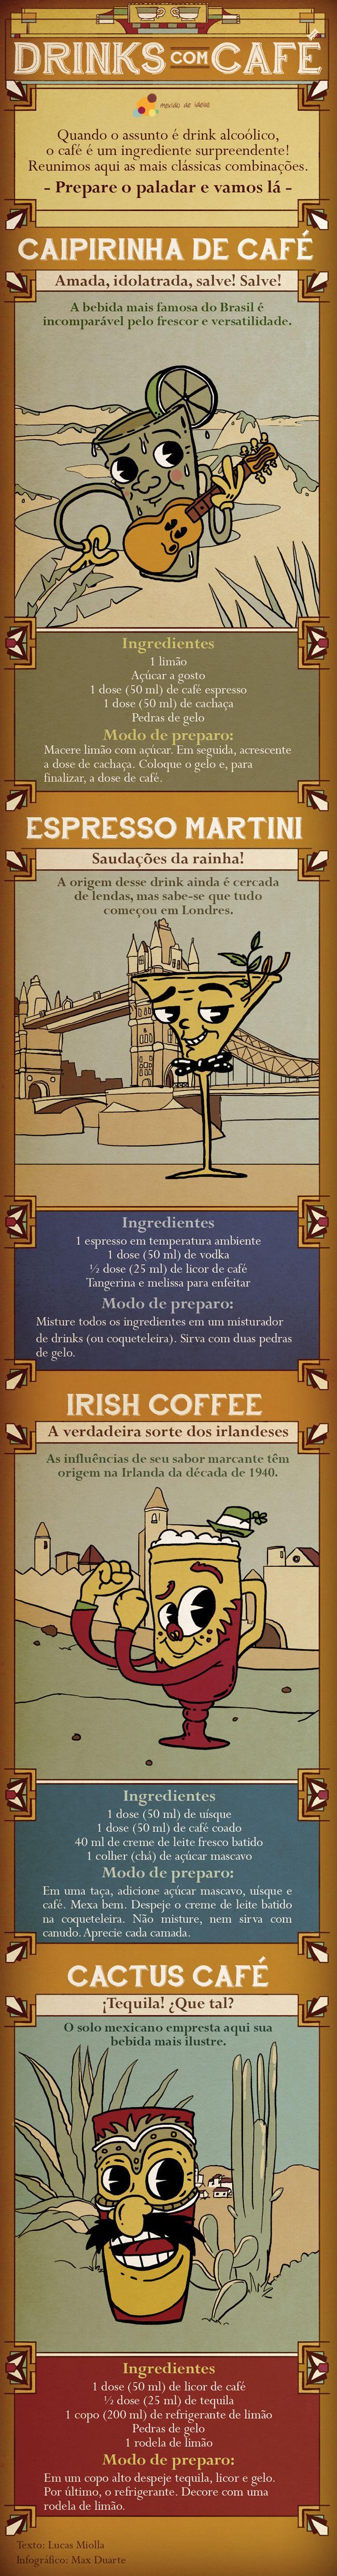 infografico-drinks-cafe